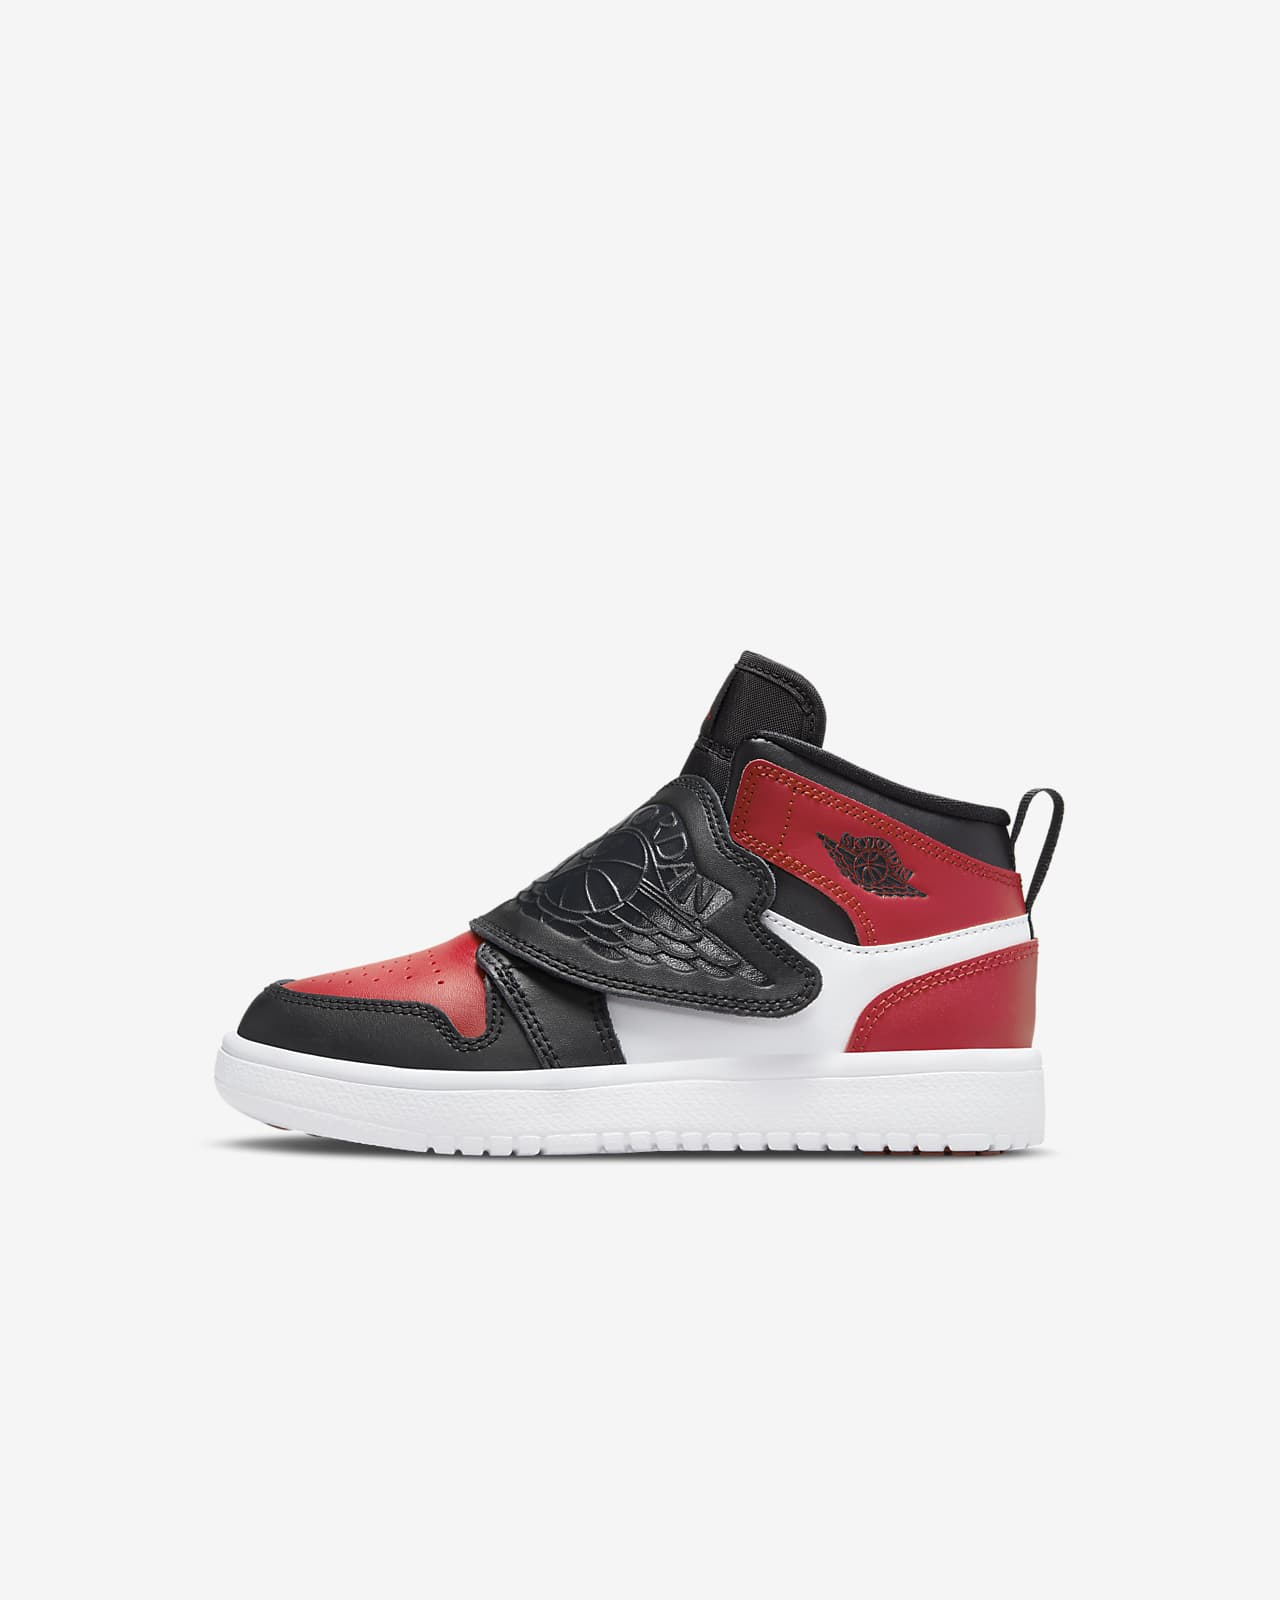 Sky Jordan 1 Younger Kids' Shoe. Nike ID